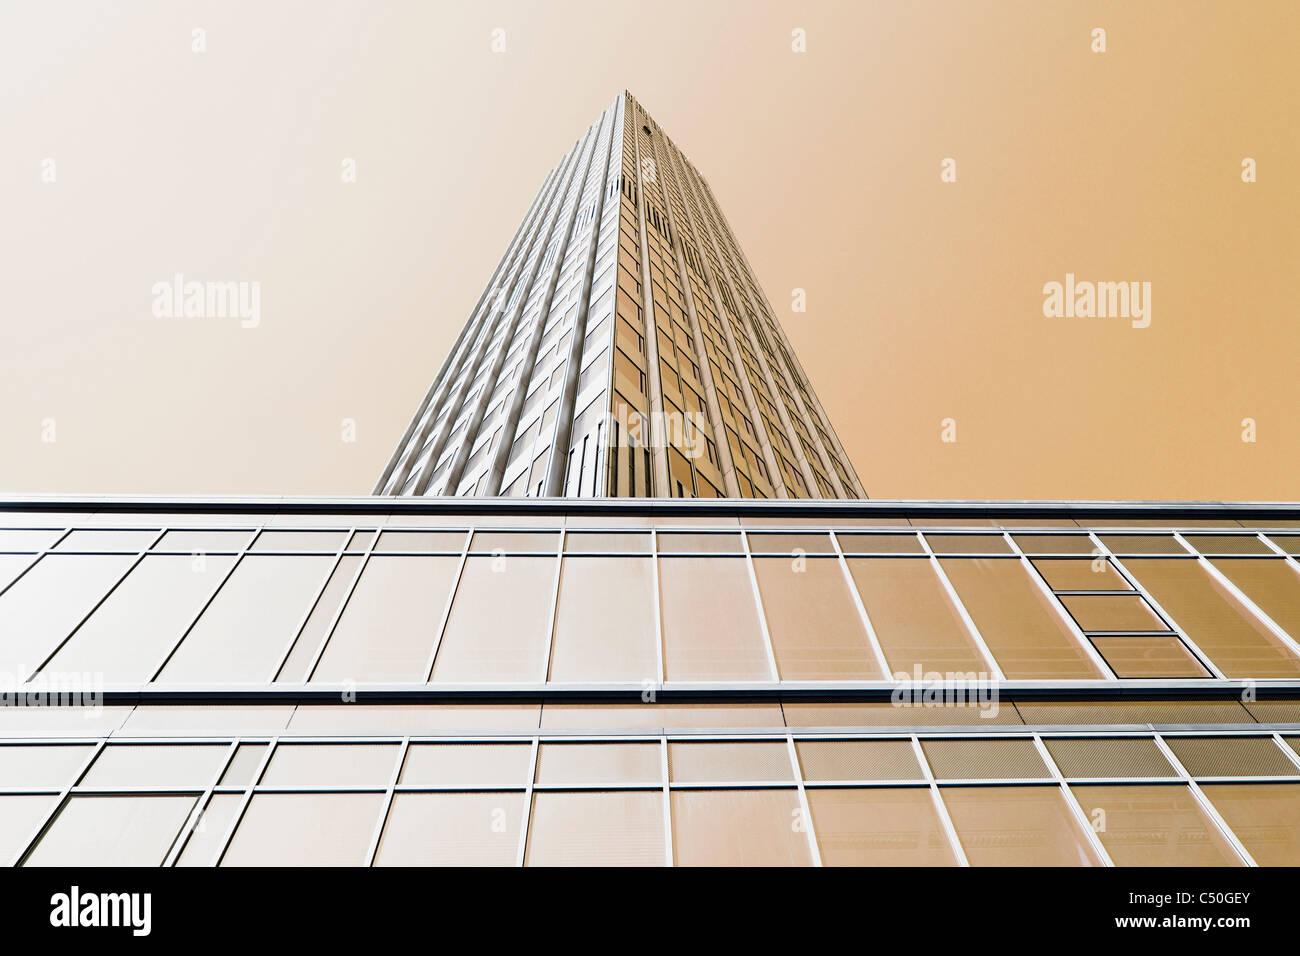 European Central Bank Tower, ECB tower, EZB Tower, facade, creative, urban, Frankfurt am Main, Hesse, Germany, Europe - Stock Image